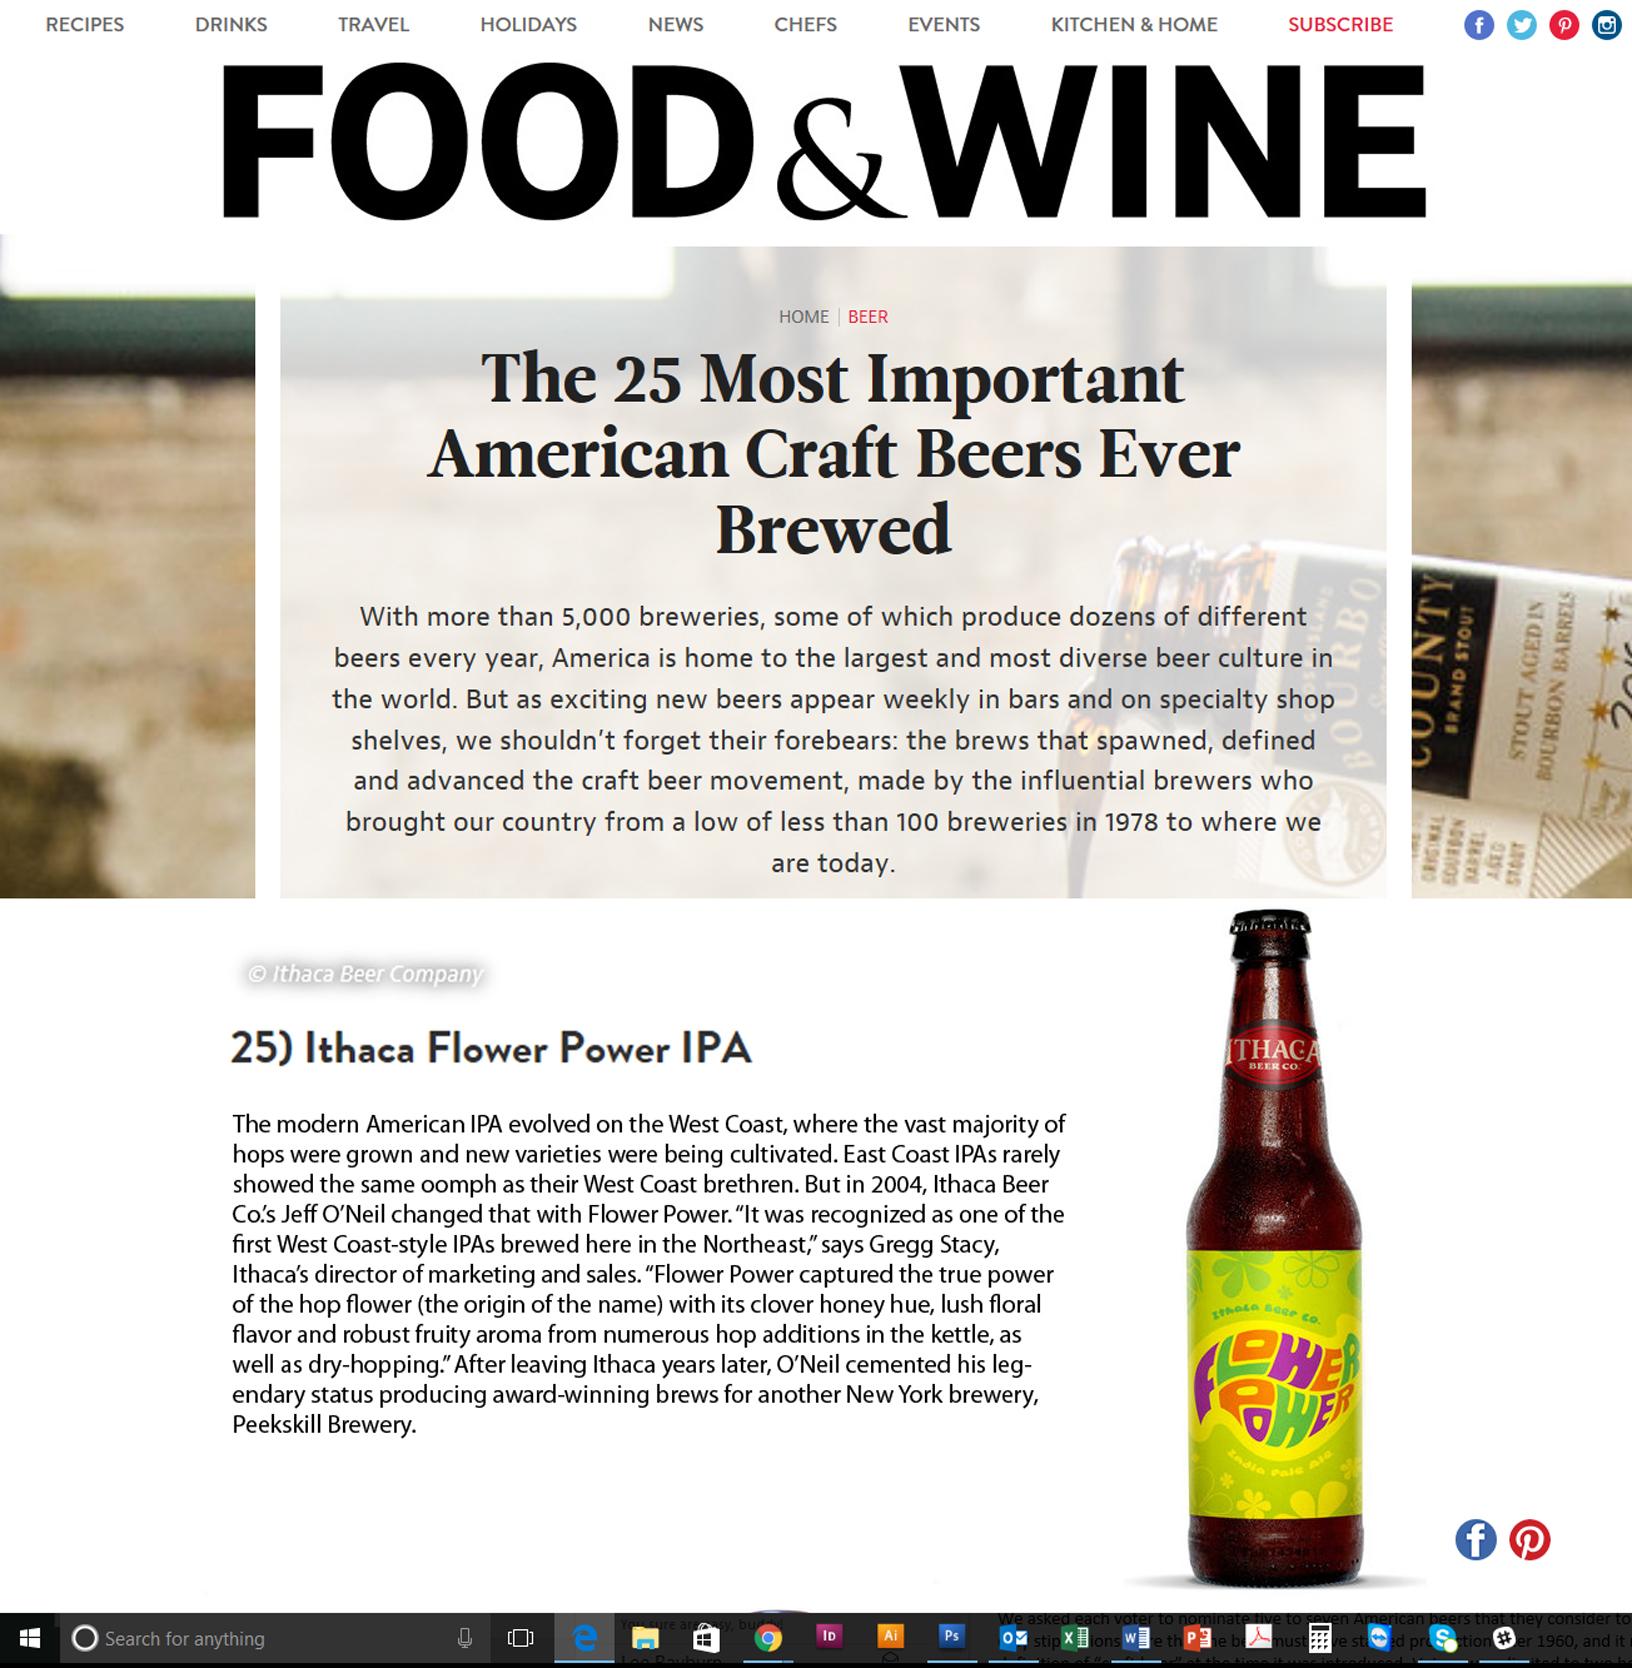 Food & Wine 25 Graphic.jpg